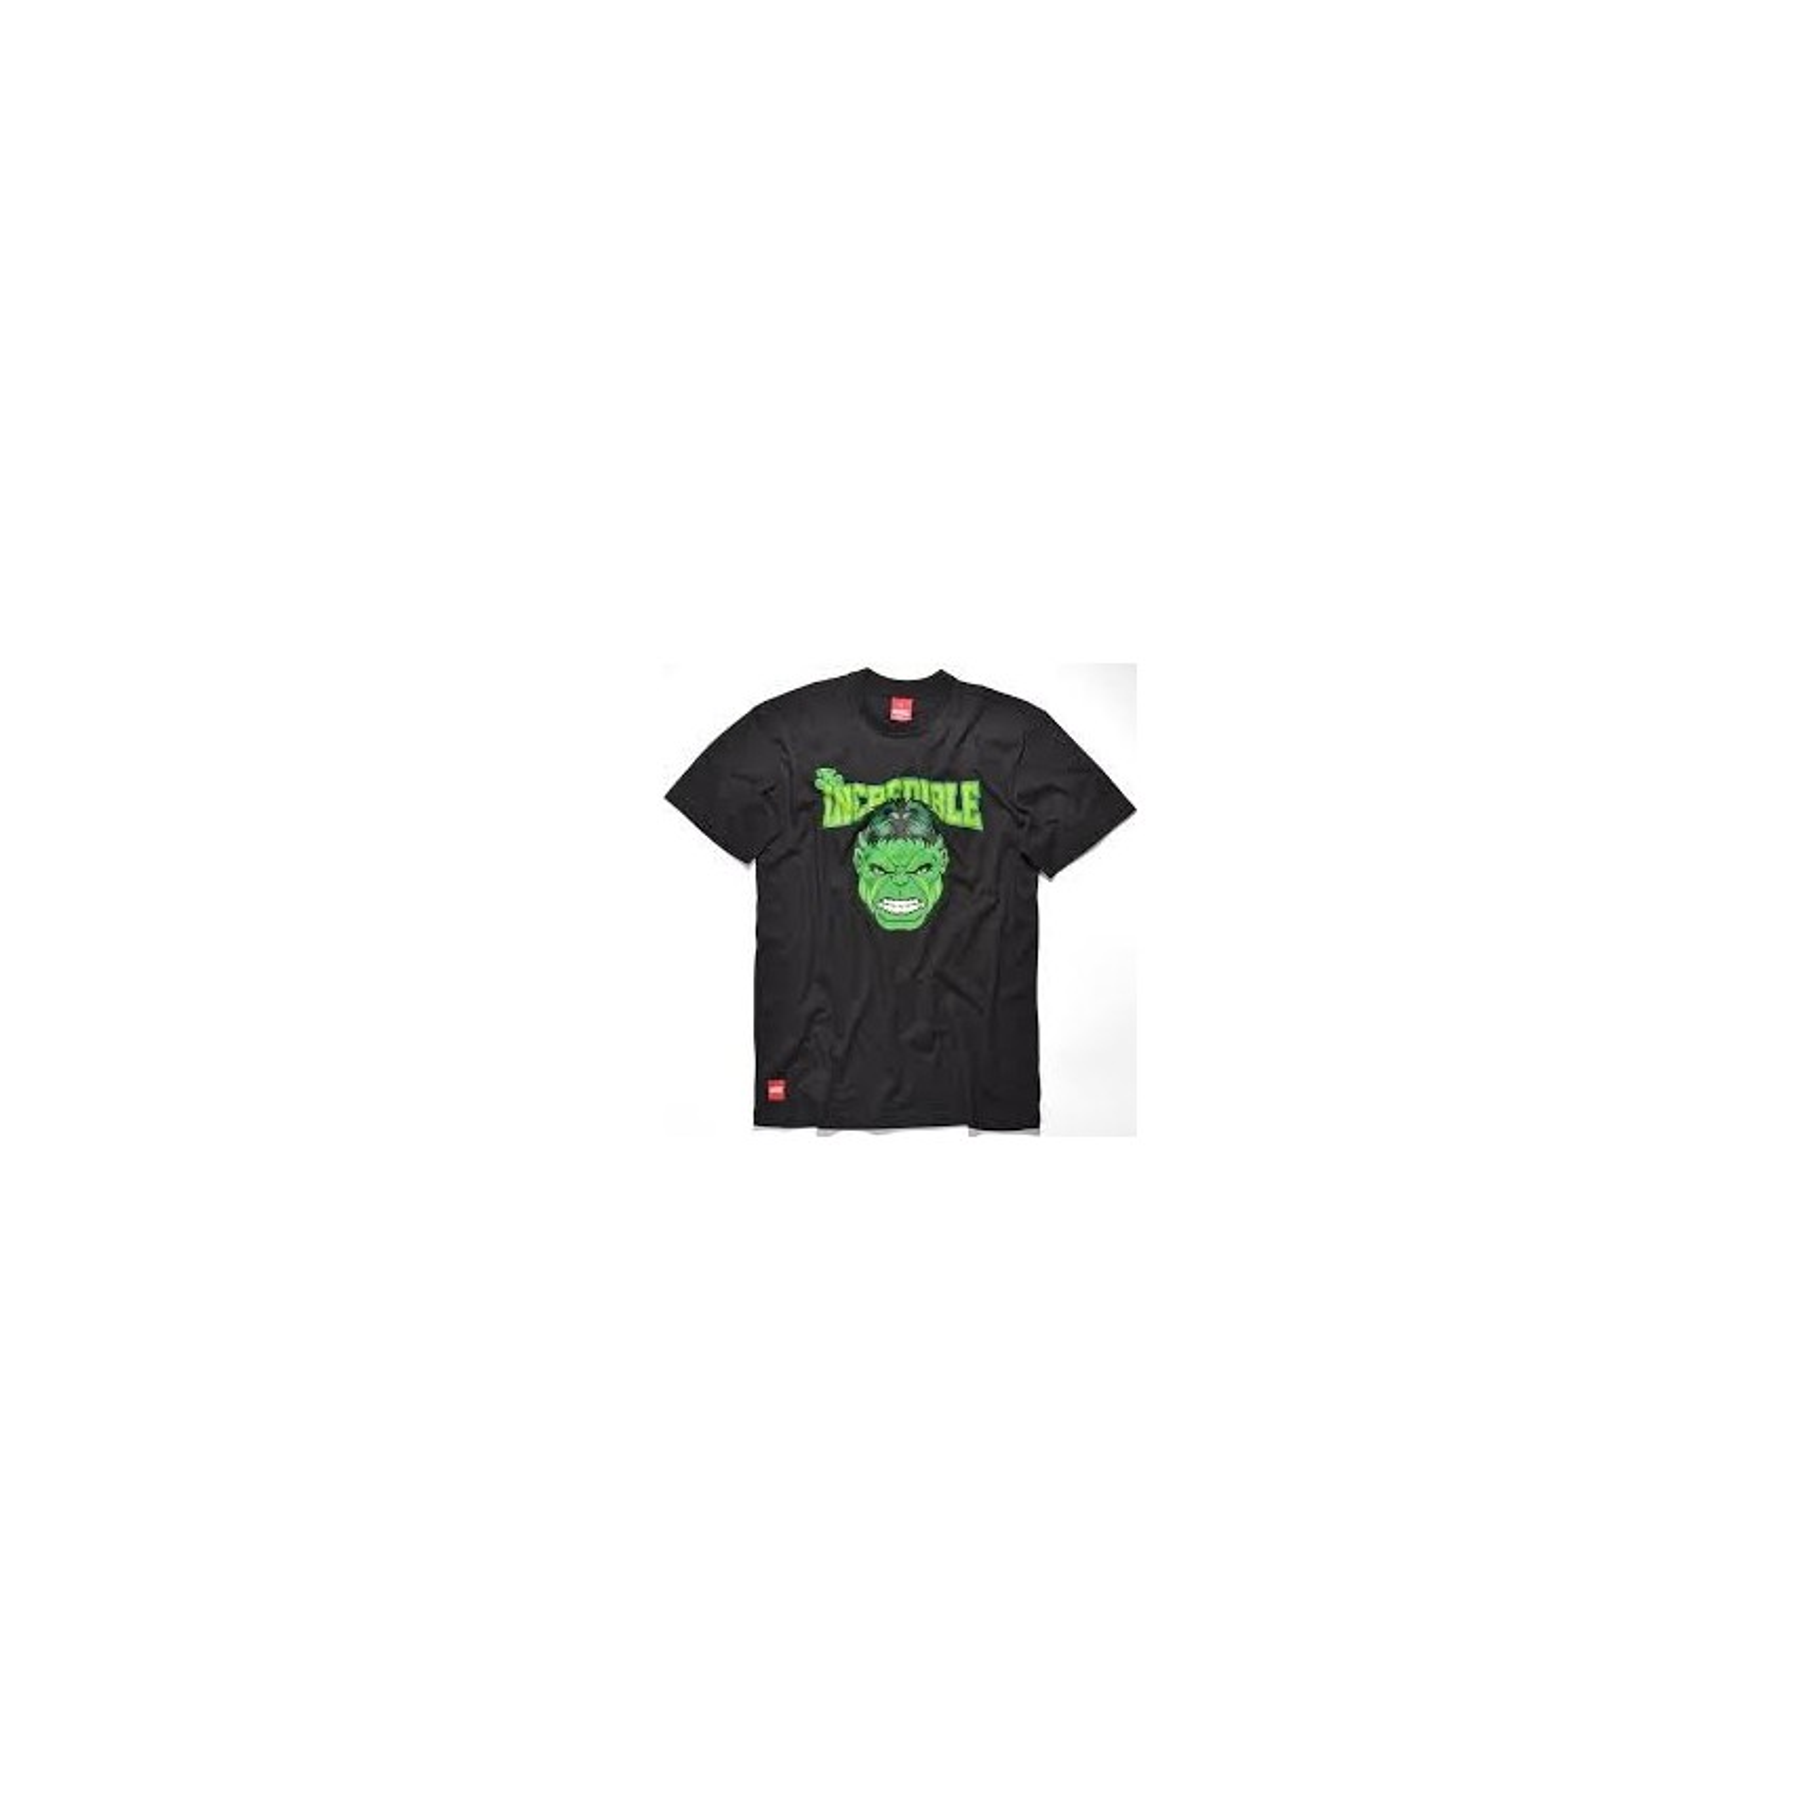 Hulk Unico Marvel Incredible Addict College Black Shirt Maglietta T IWD9Y2EH